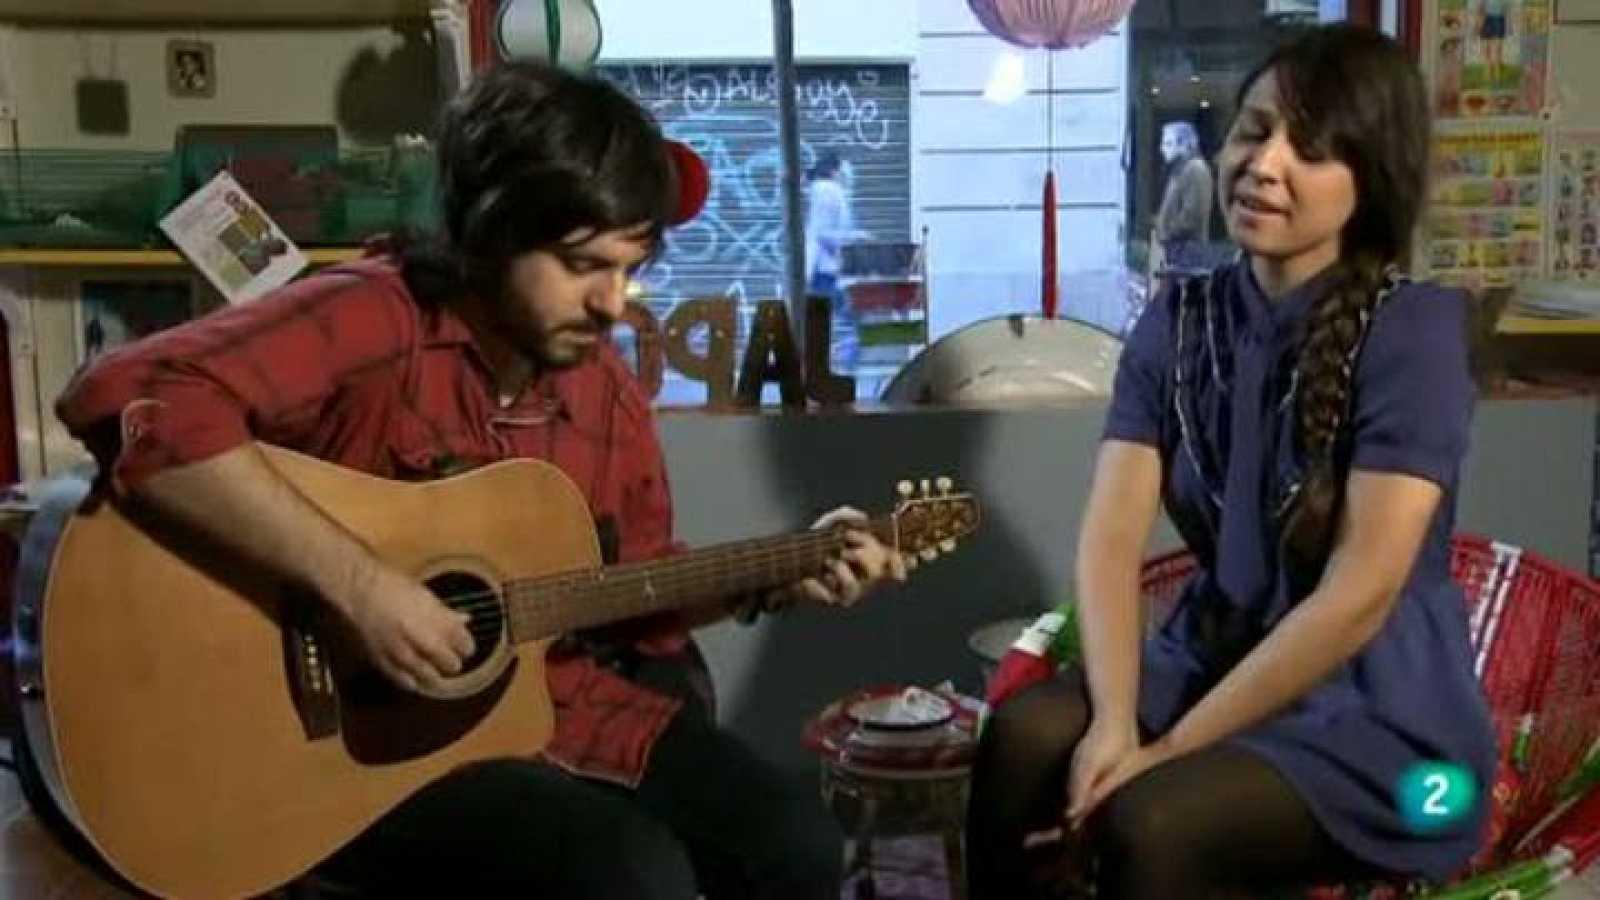 Miradas 2 -  Lidia Guevara